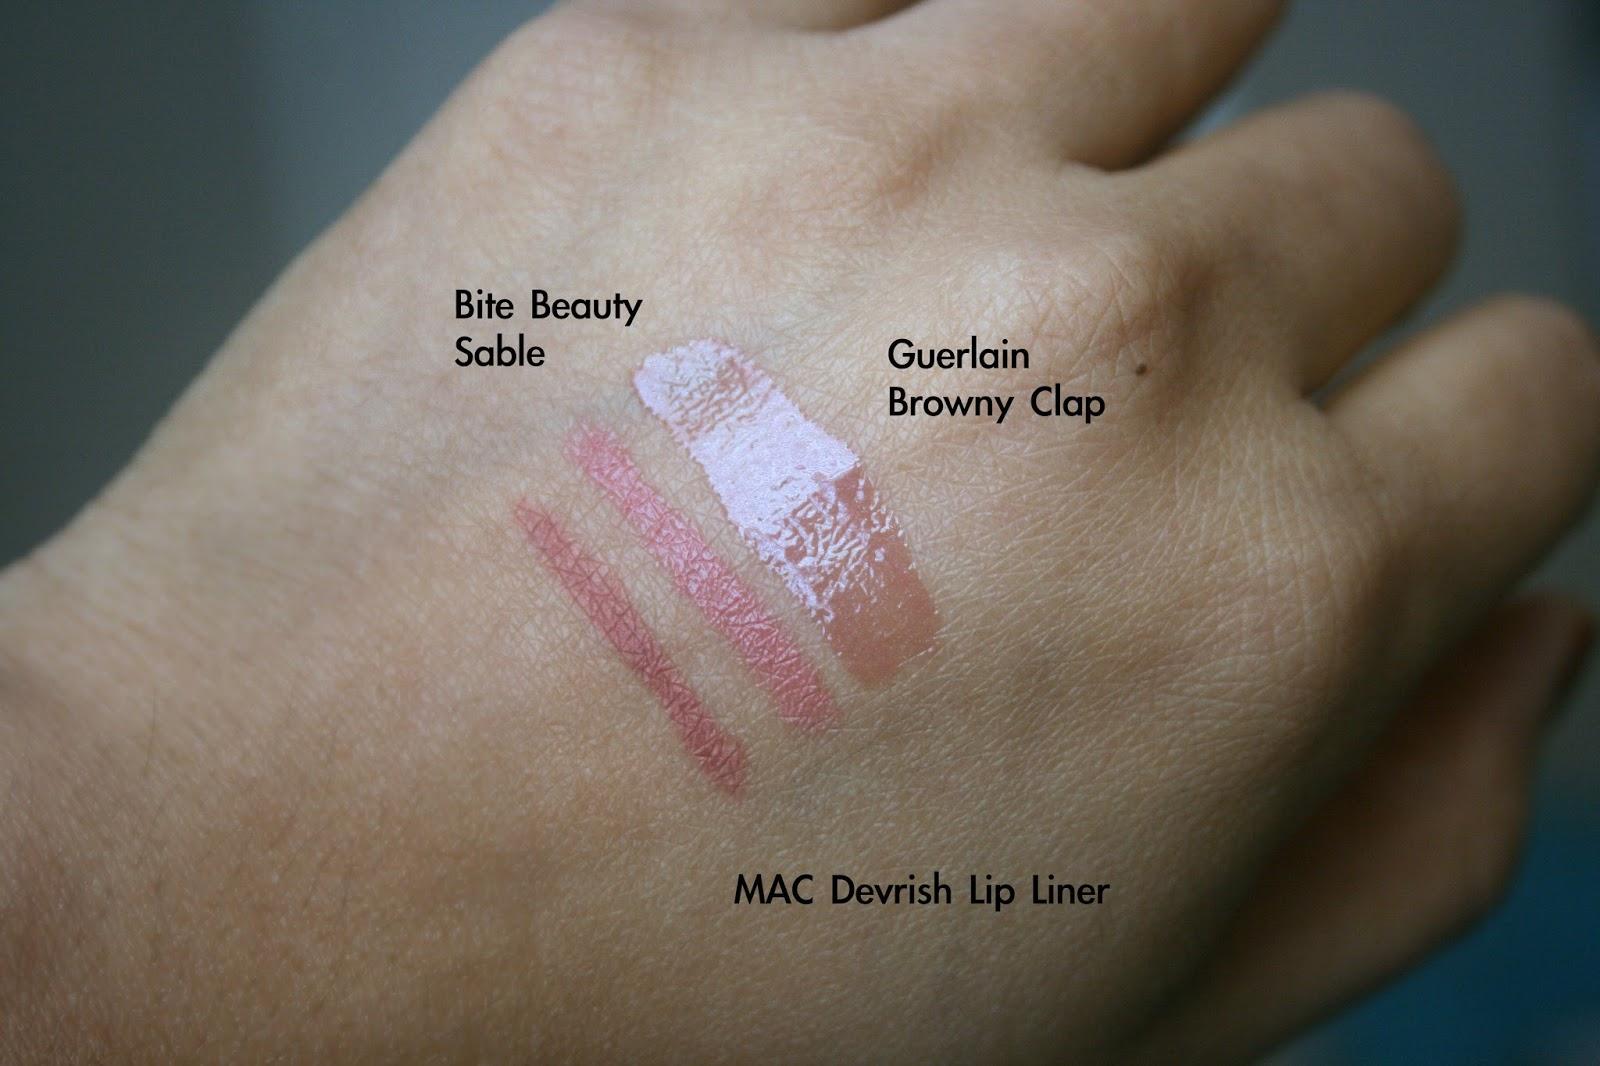 Nude Lips for Medium Dark Skintones - MAC Dervish Lip Liner, Bite Beauty Sable, Guerlain Maxi Shine Lip Gloss in Browny Clap  Swatches